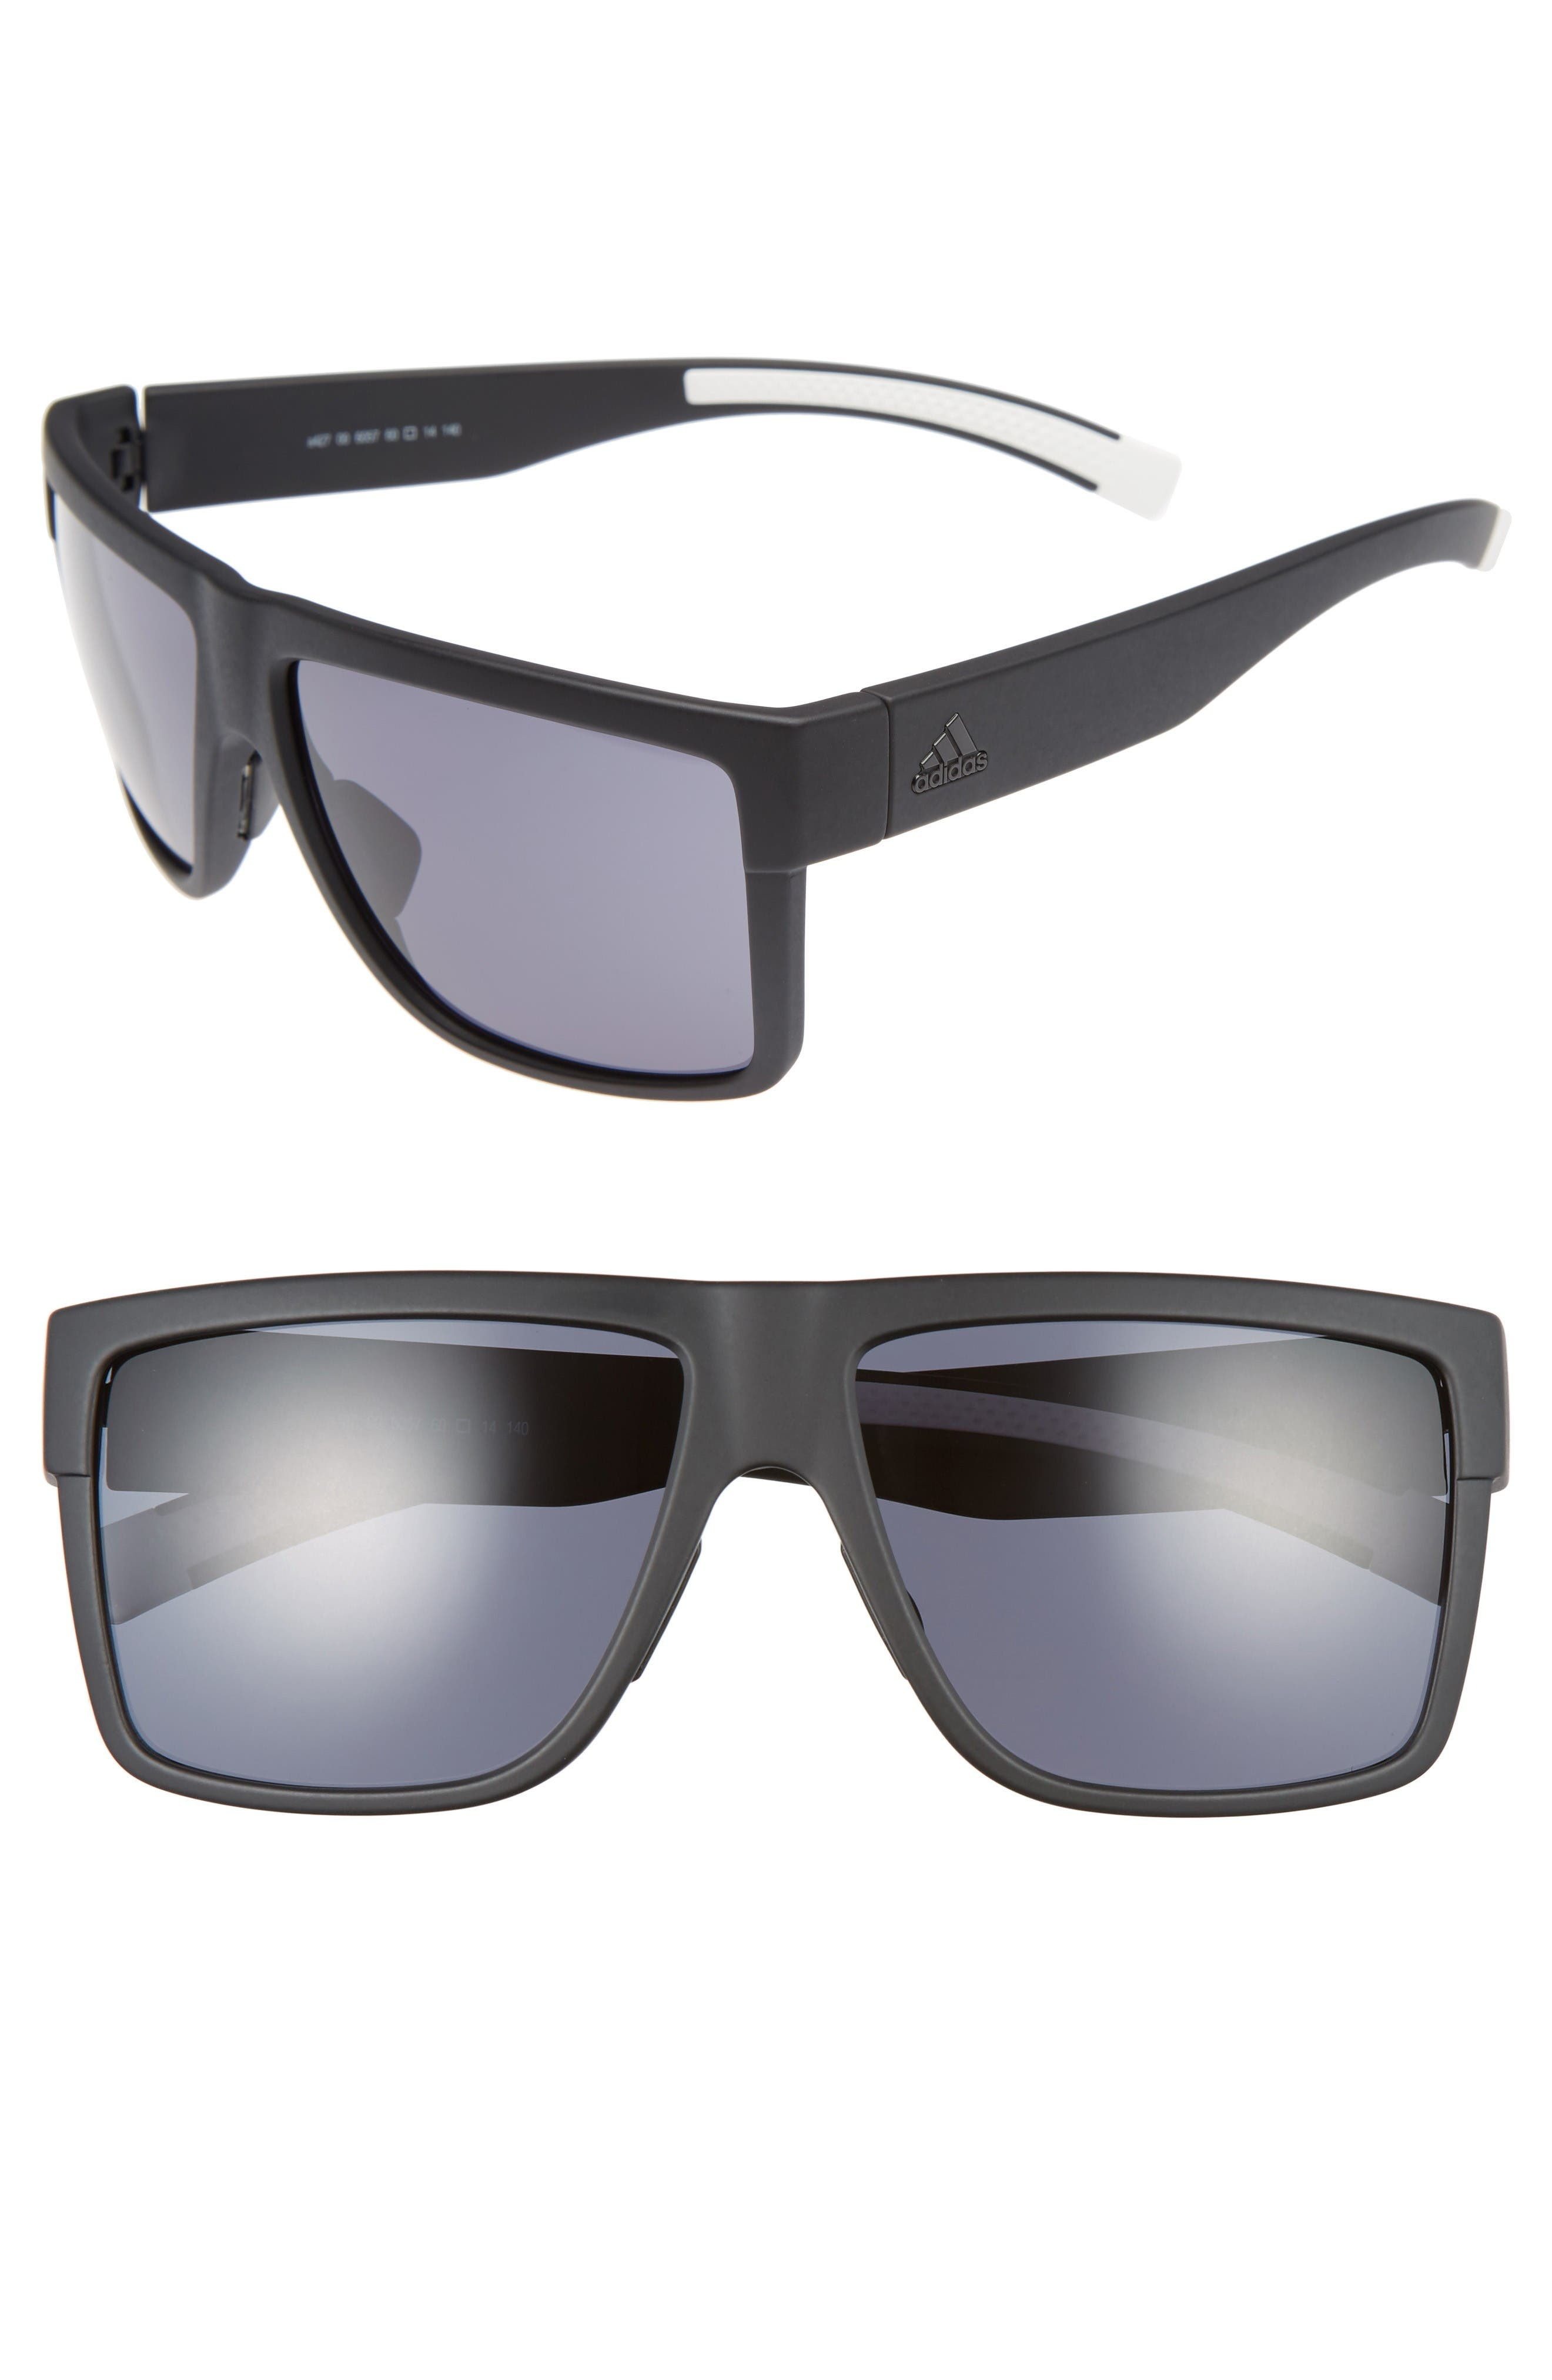 3Matic 60mm Sunglasses,                             Main thumbnail 1, color,                             Black Matte/ Grey